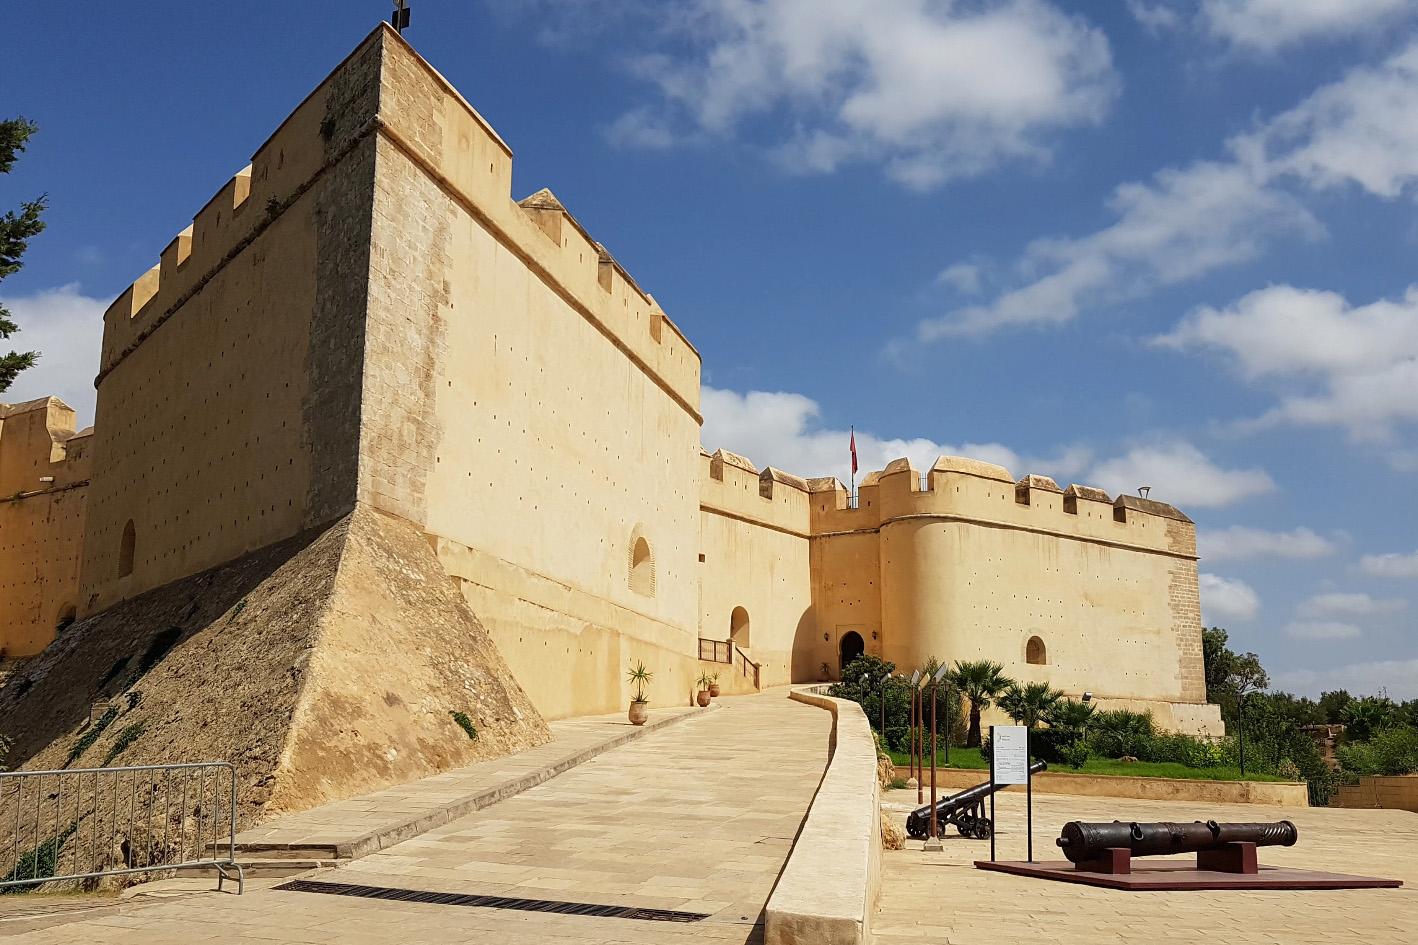 Касба в городе Фес, Марокко